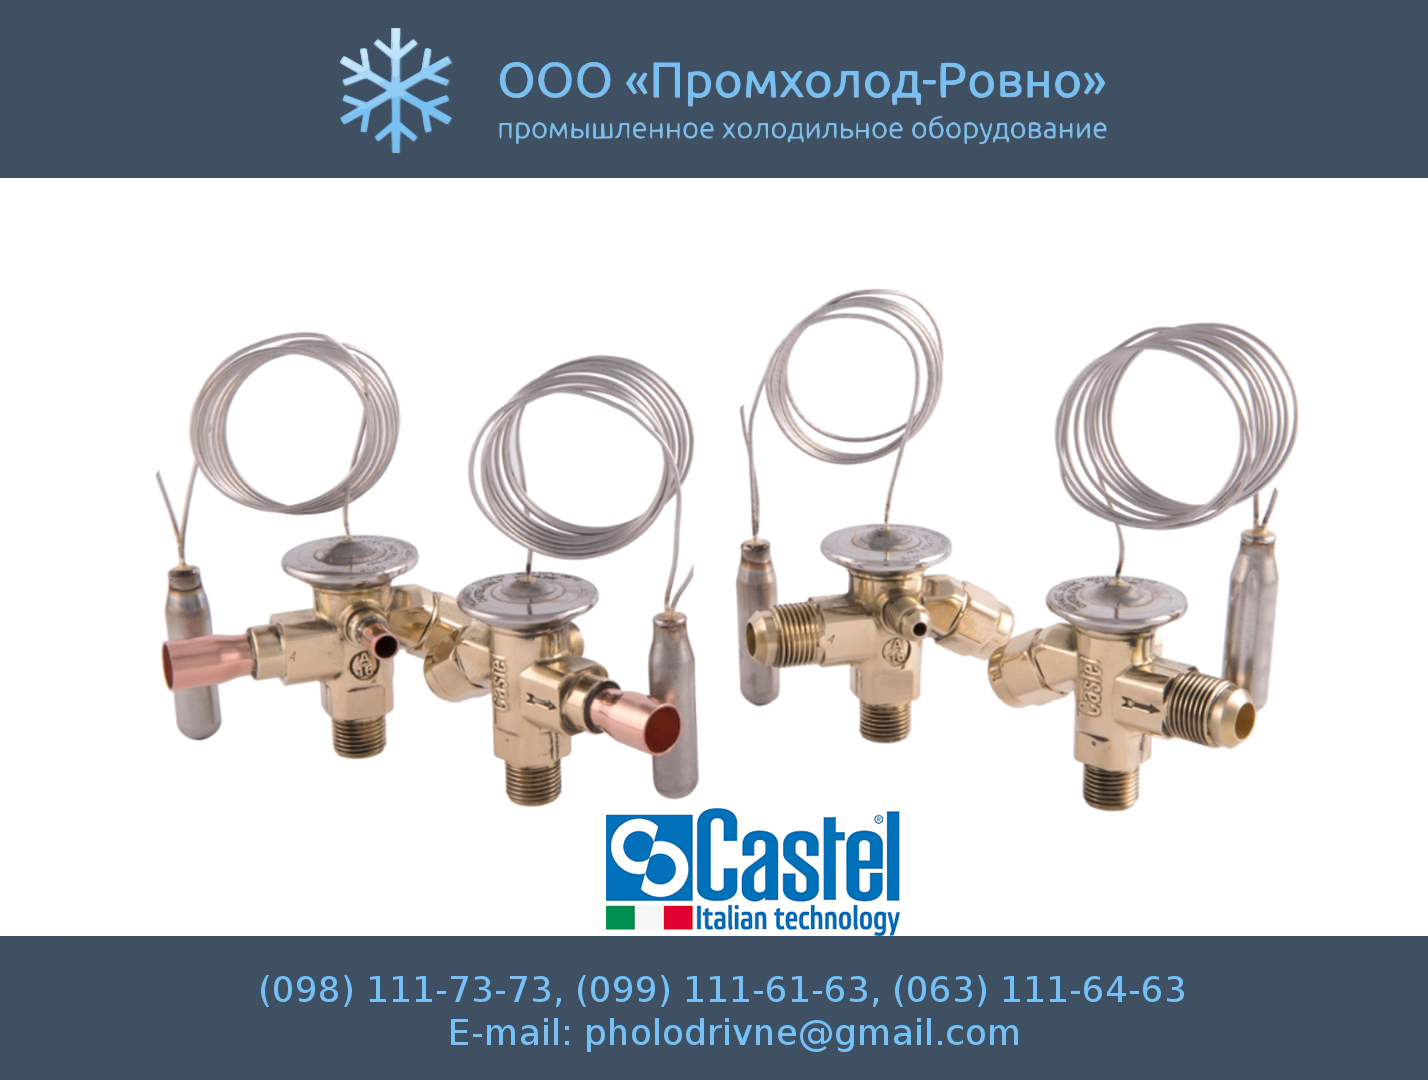 Термо-регулирующие вентили Castel